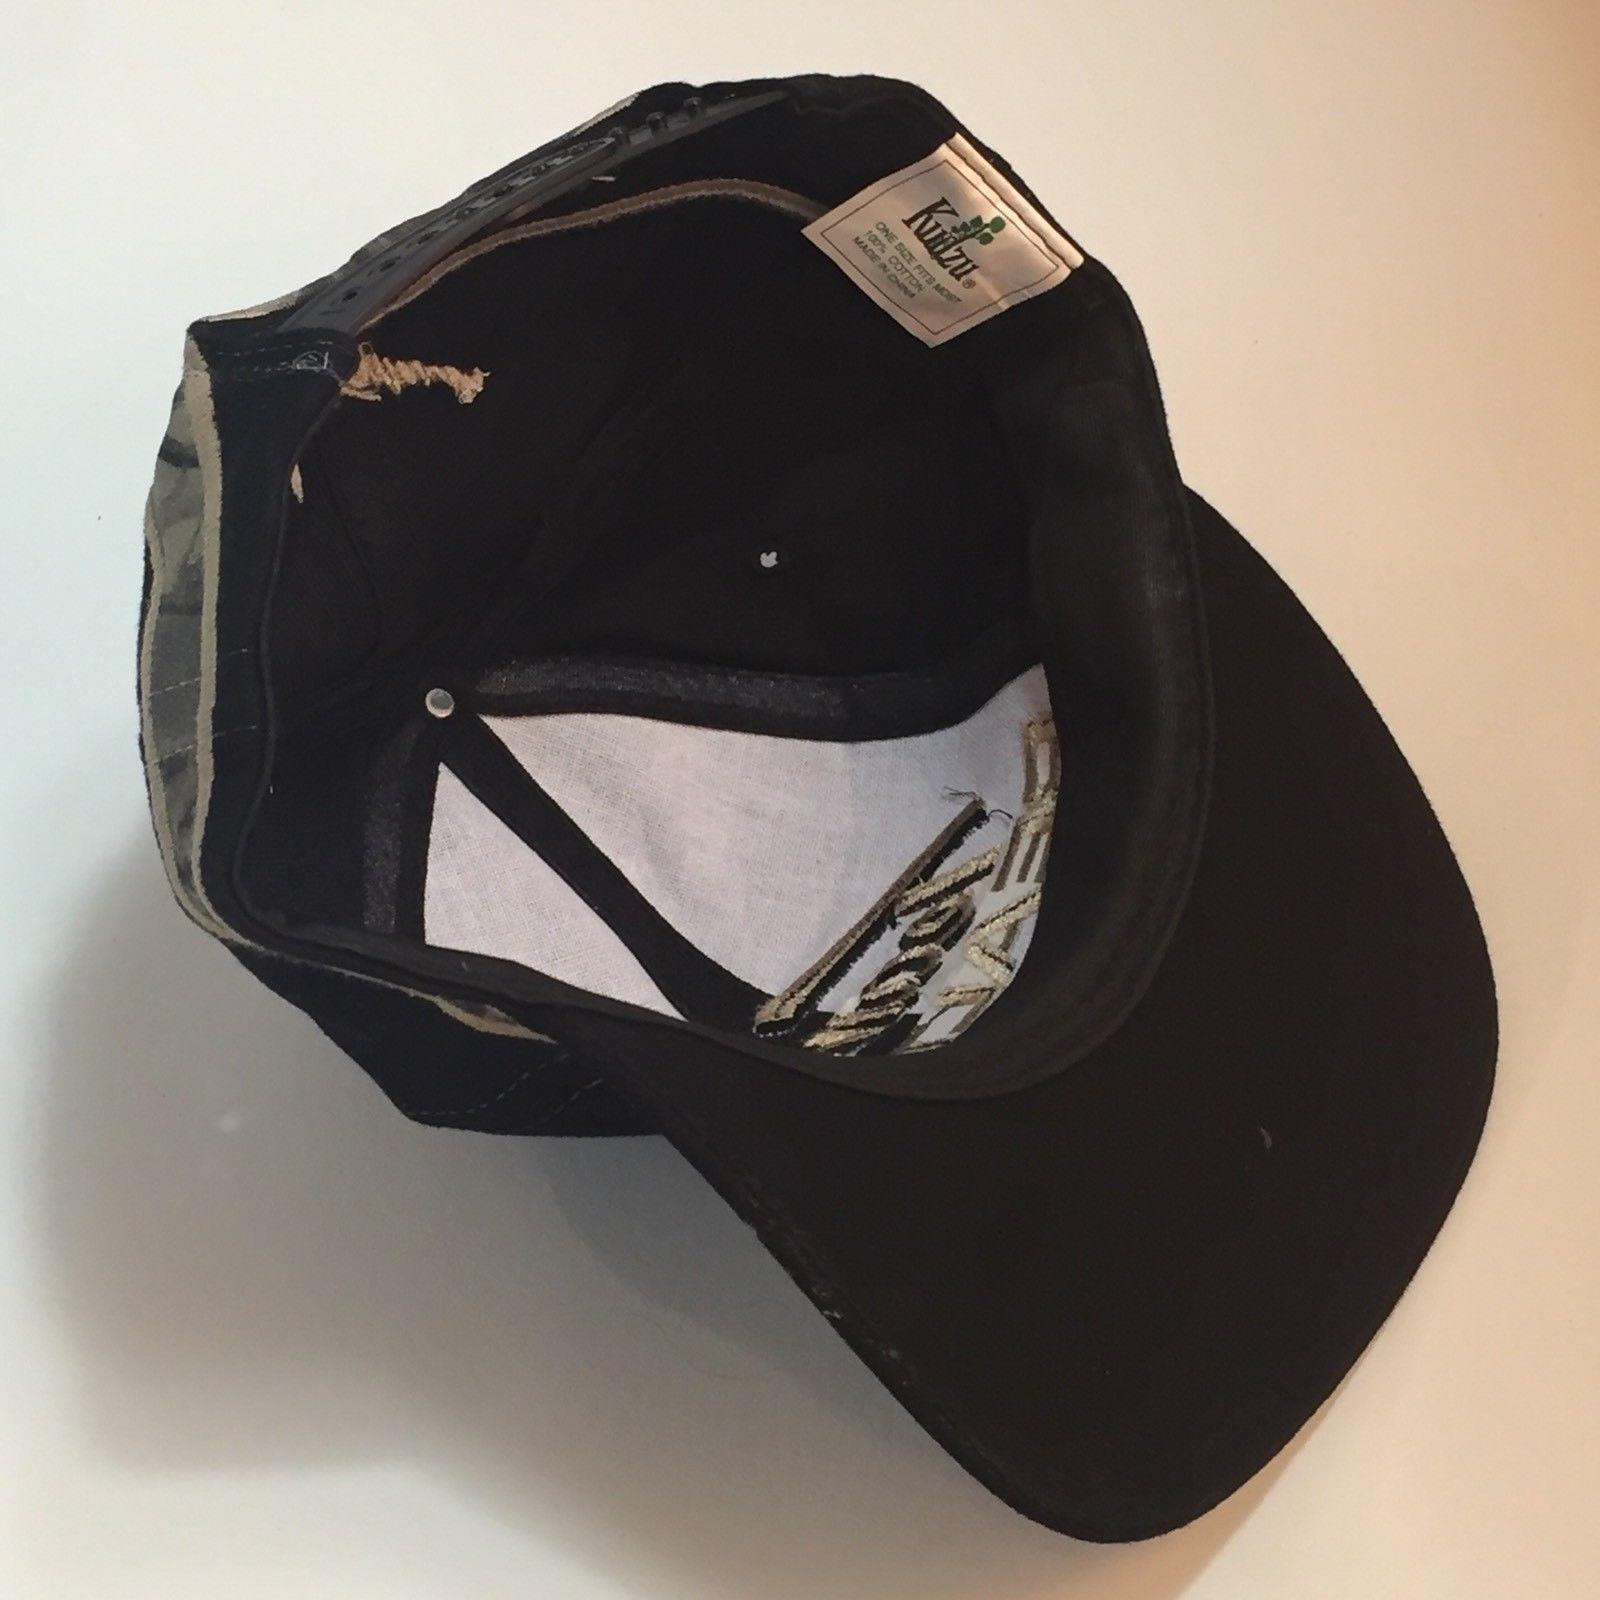 Vintage Team Realtree Embroidered Baseball Cap Snapback Hat